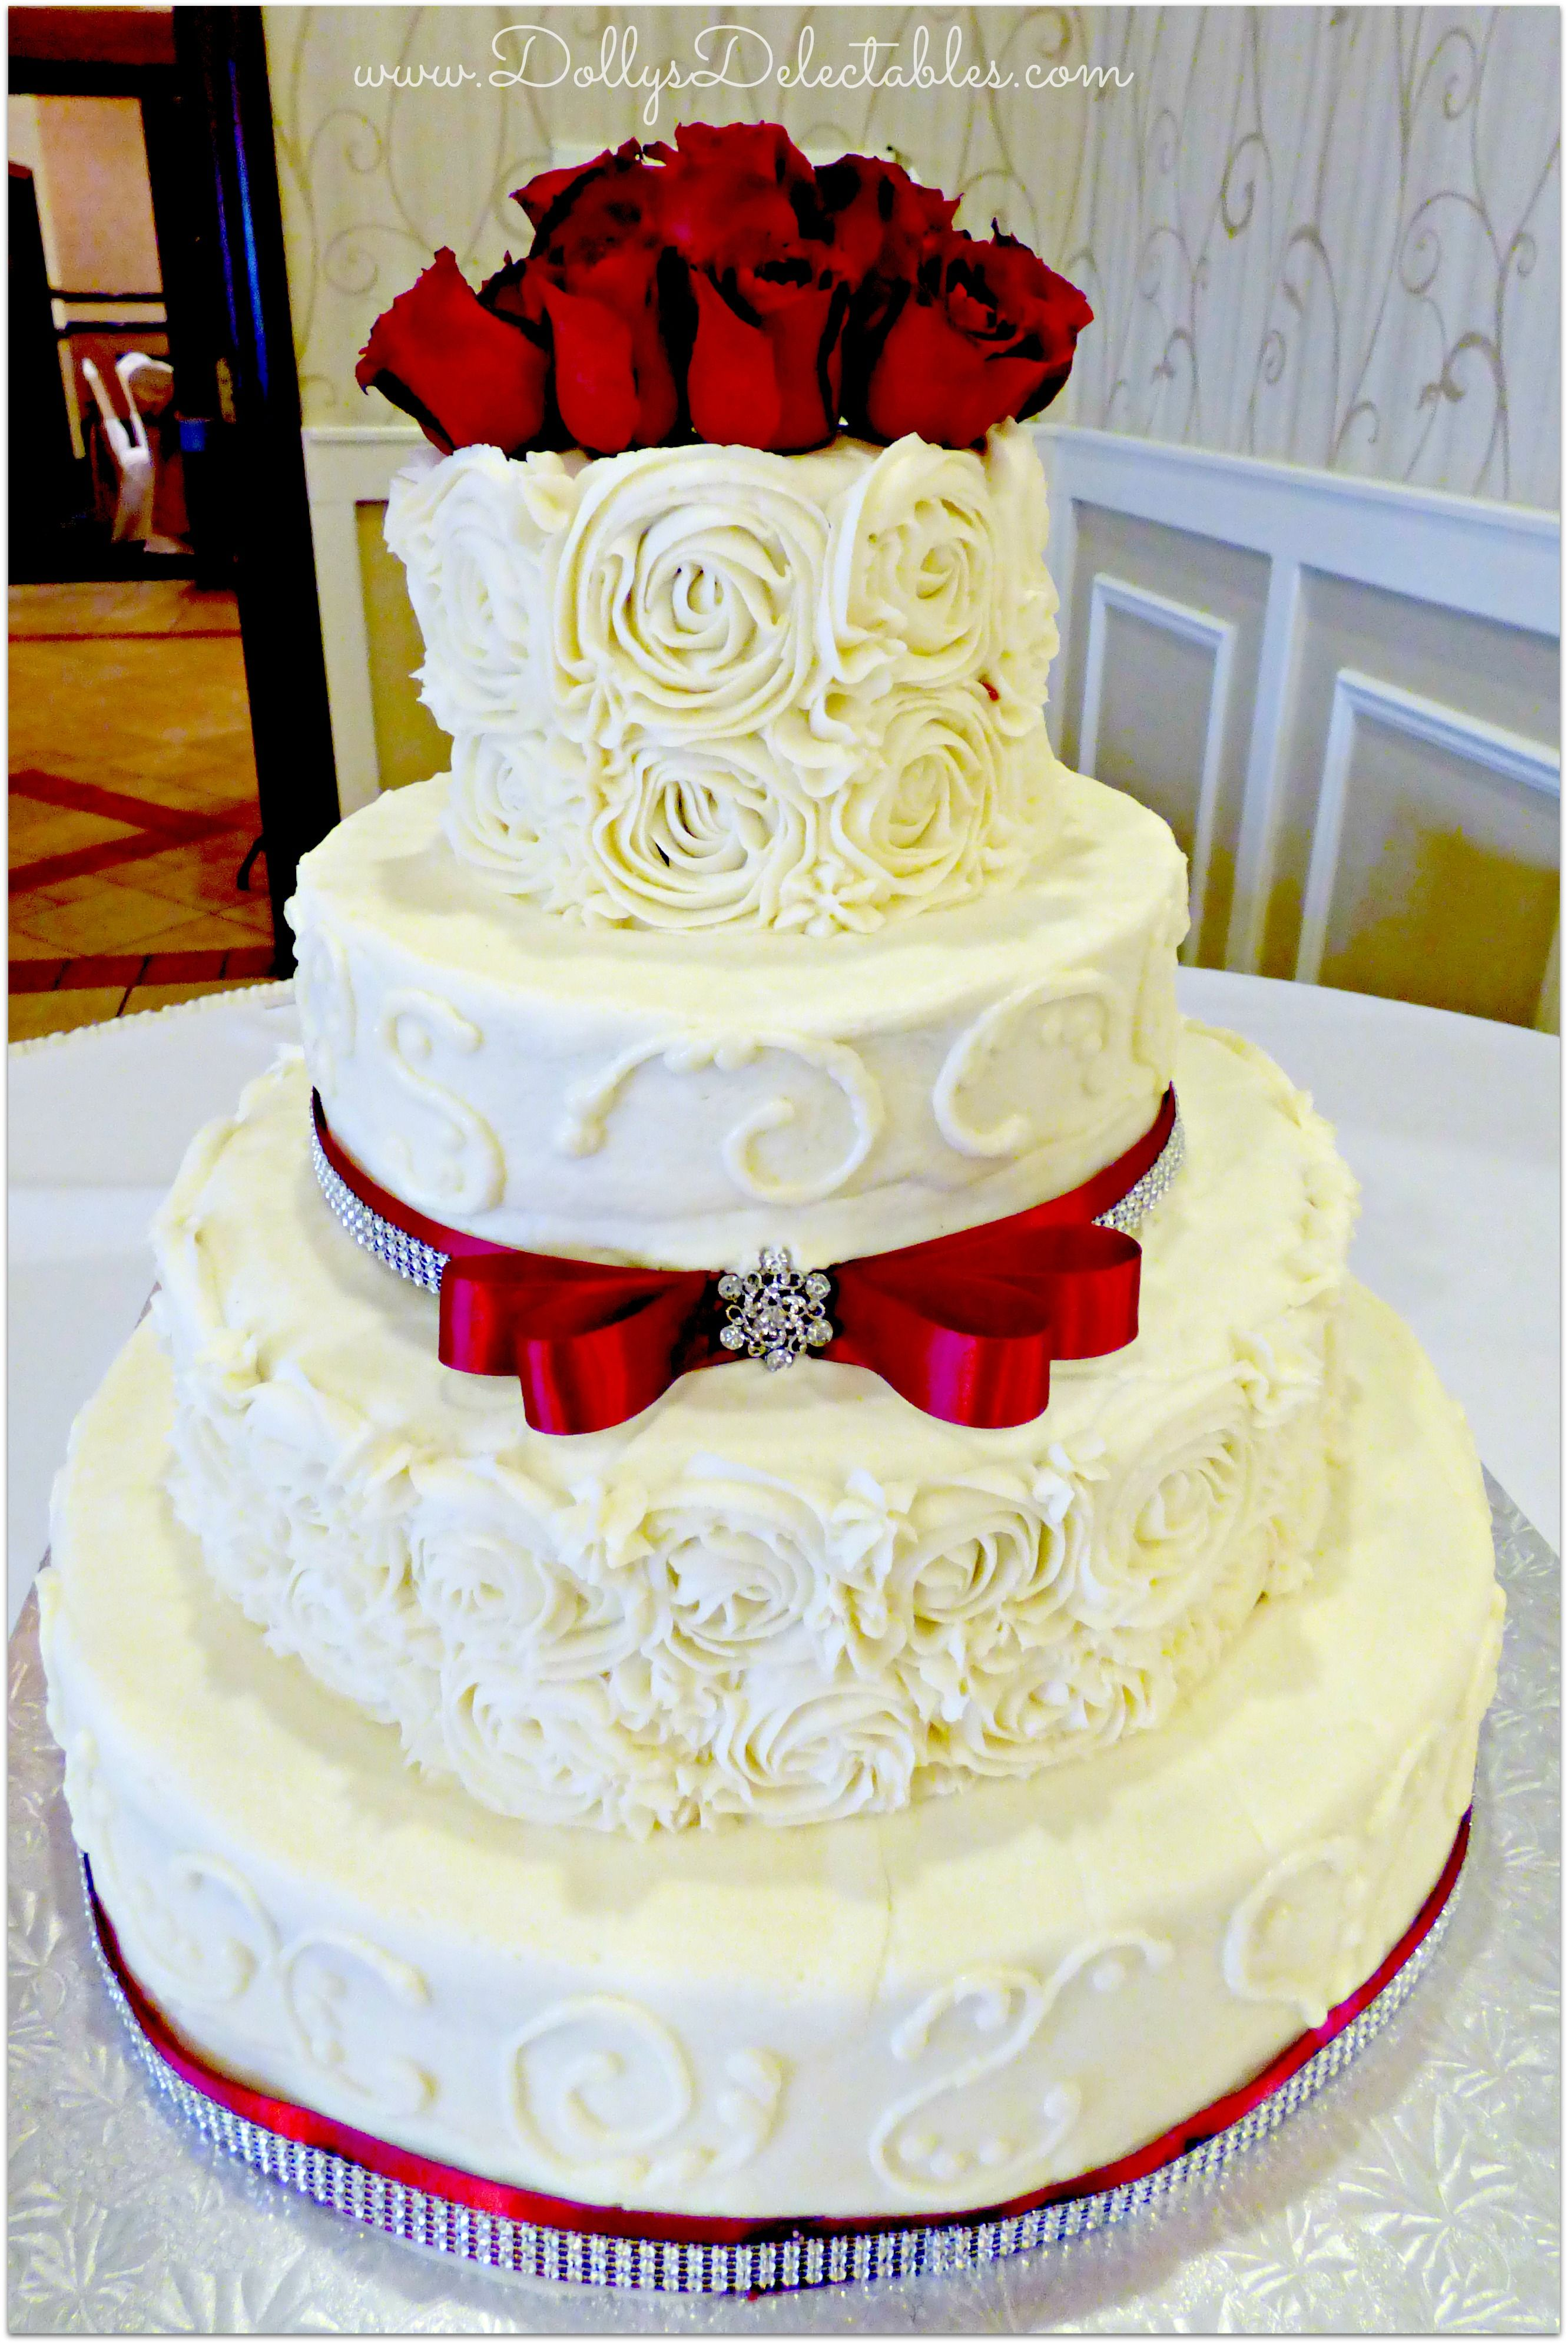 Awesome Wedding Cake No Fondant Project - Bruman MMC